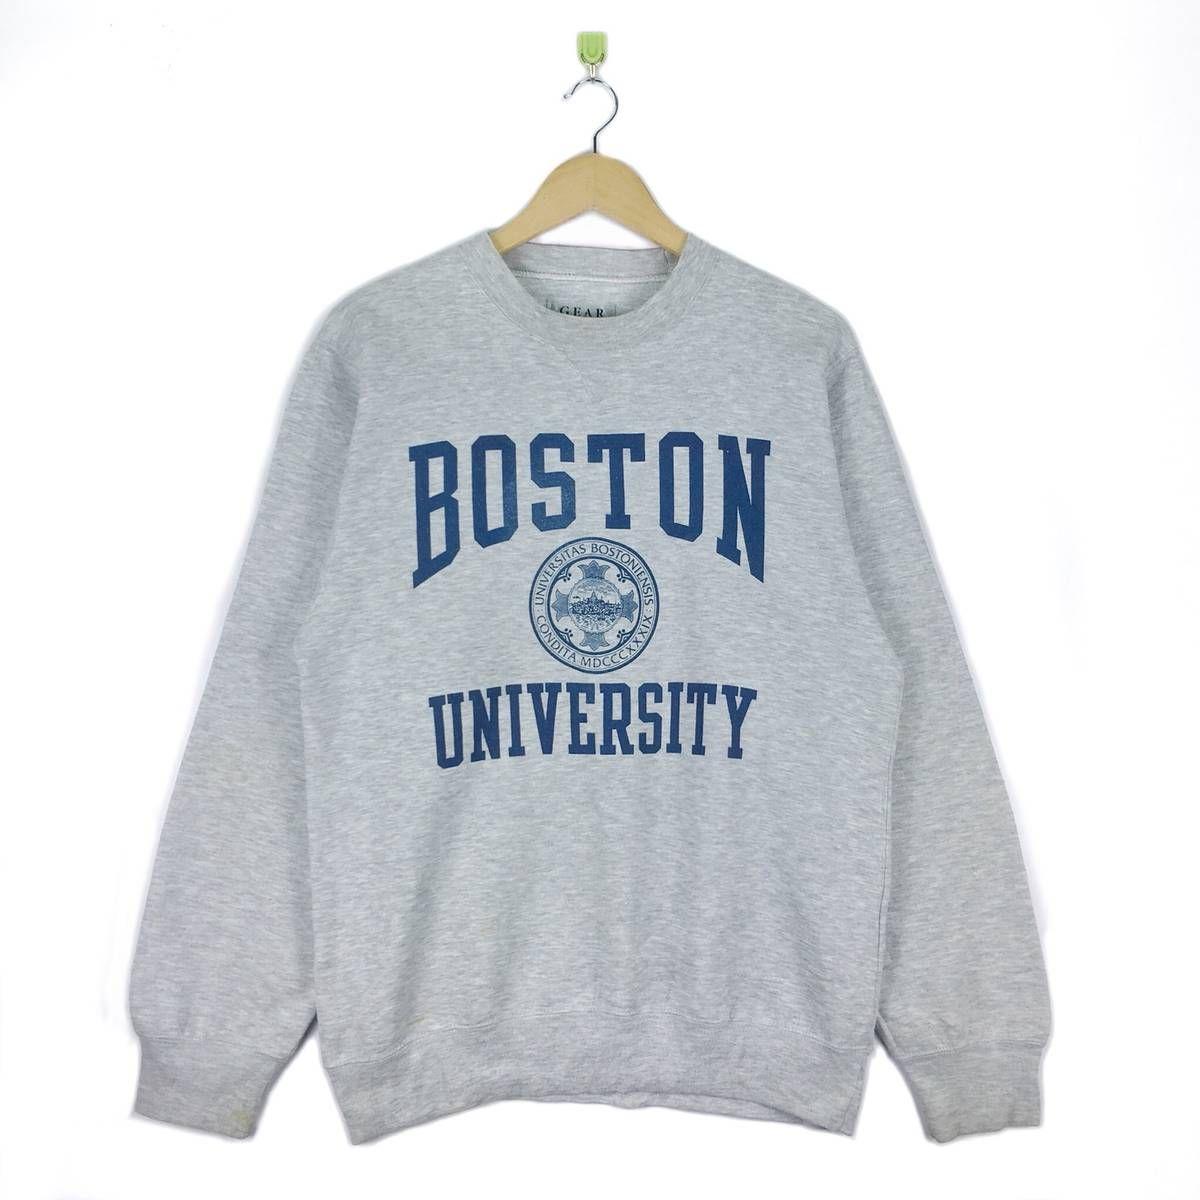 Searching For Vintage Boston University Rayon Sweatshirt Crewneck Big Logo Made In Taiwan Pullover Jum Sweatshirts Crewneck Sweatshirt Outfit Sweatshirt Outfit [ 1200 x 1200 Pixel ]